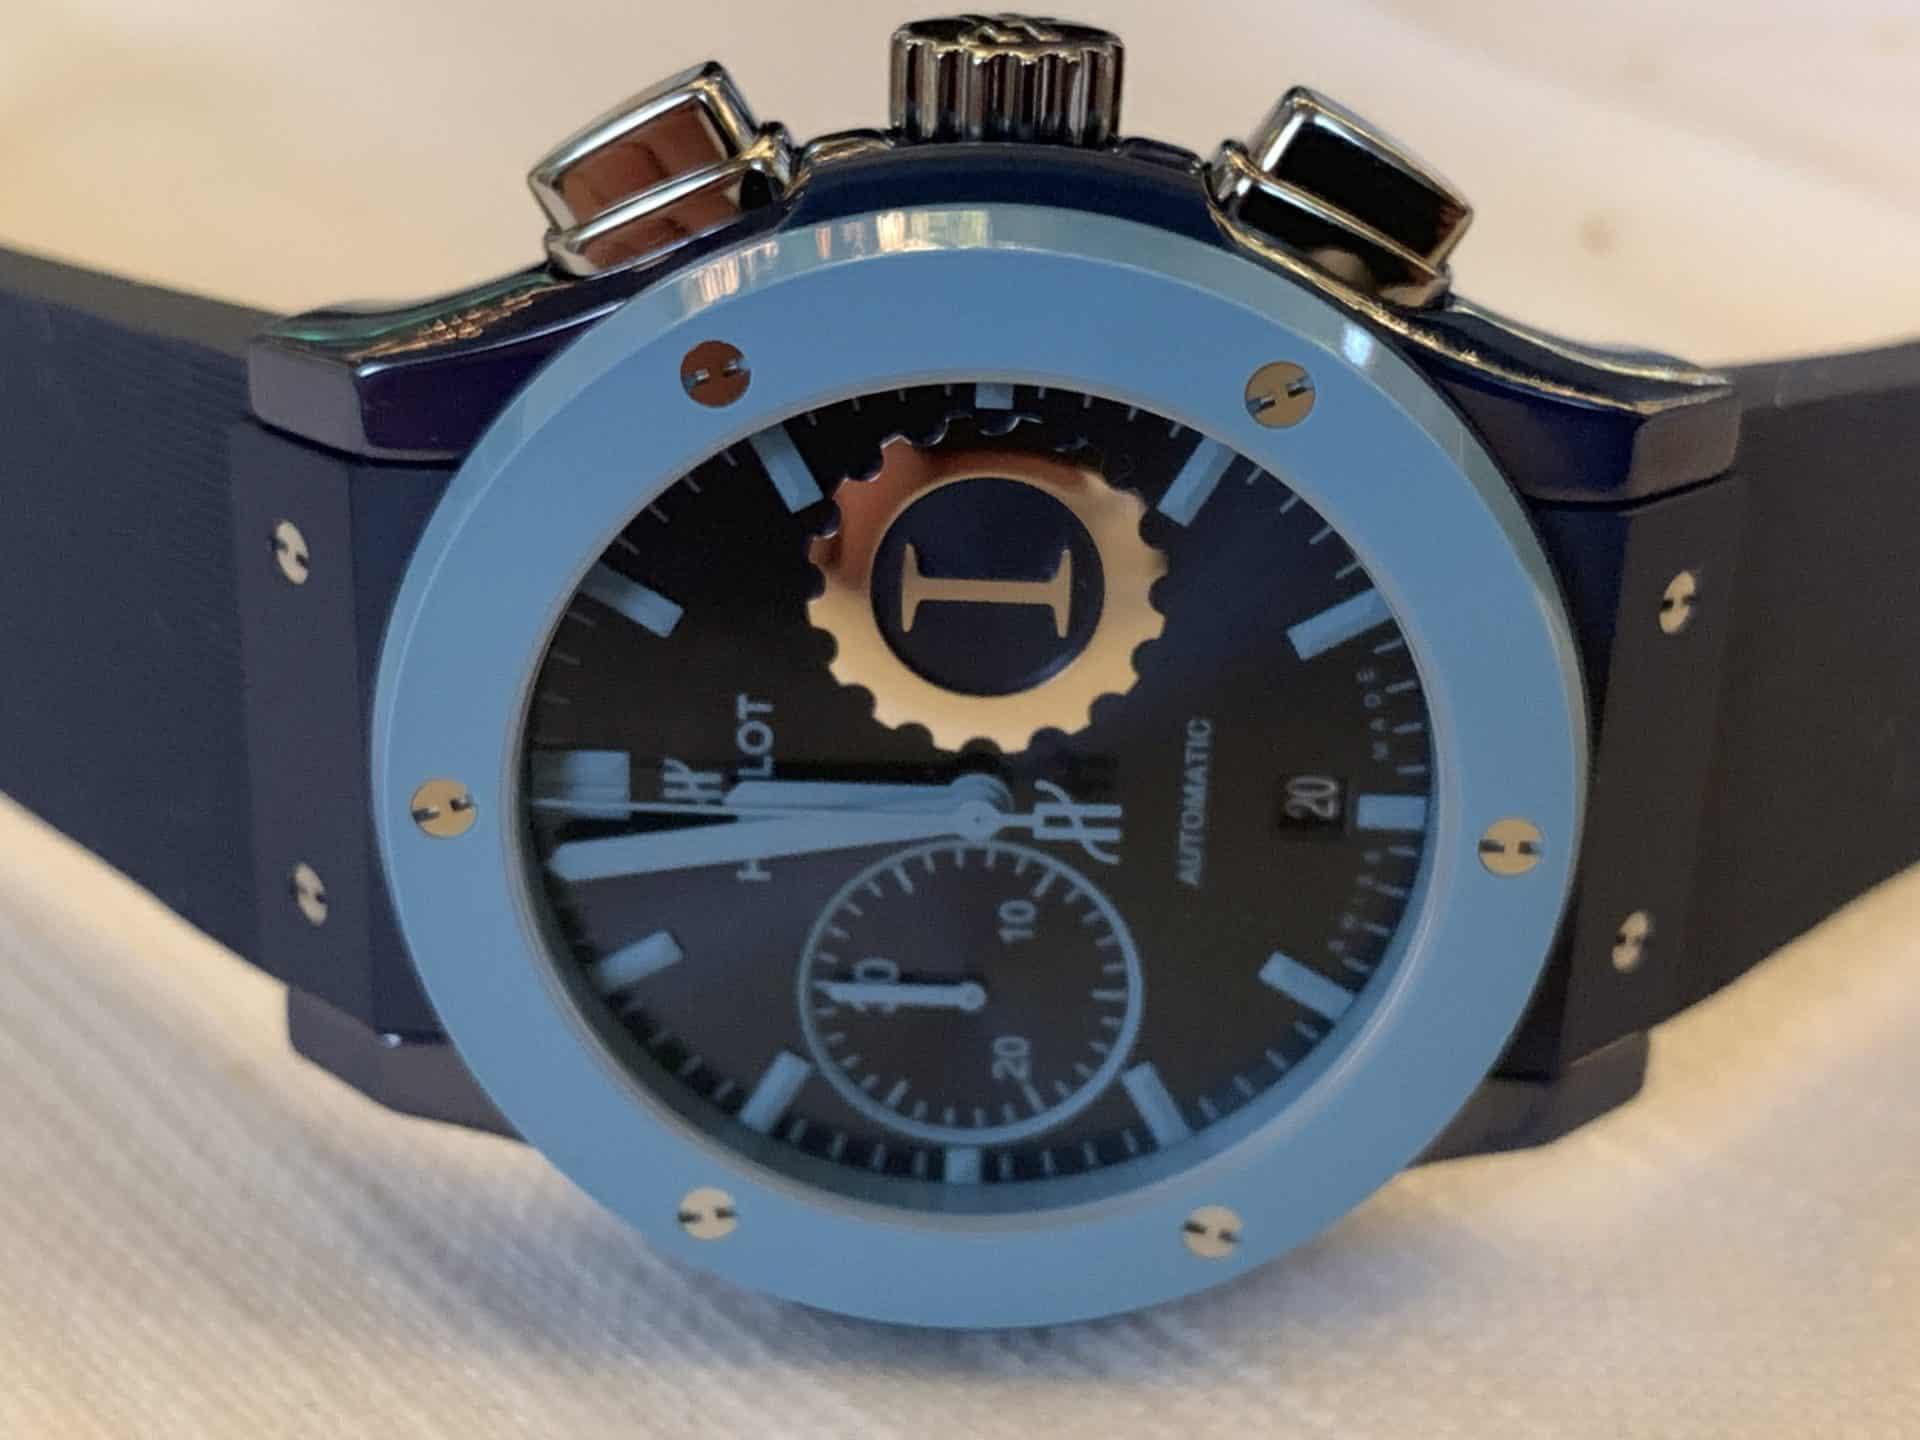 Hublot Classic Fusion Chronograph Garage Italia_05a